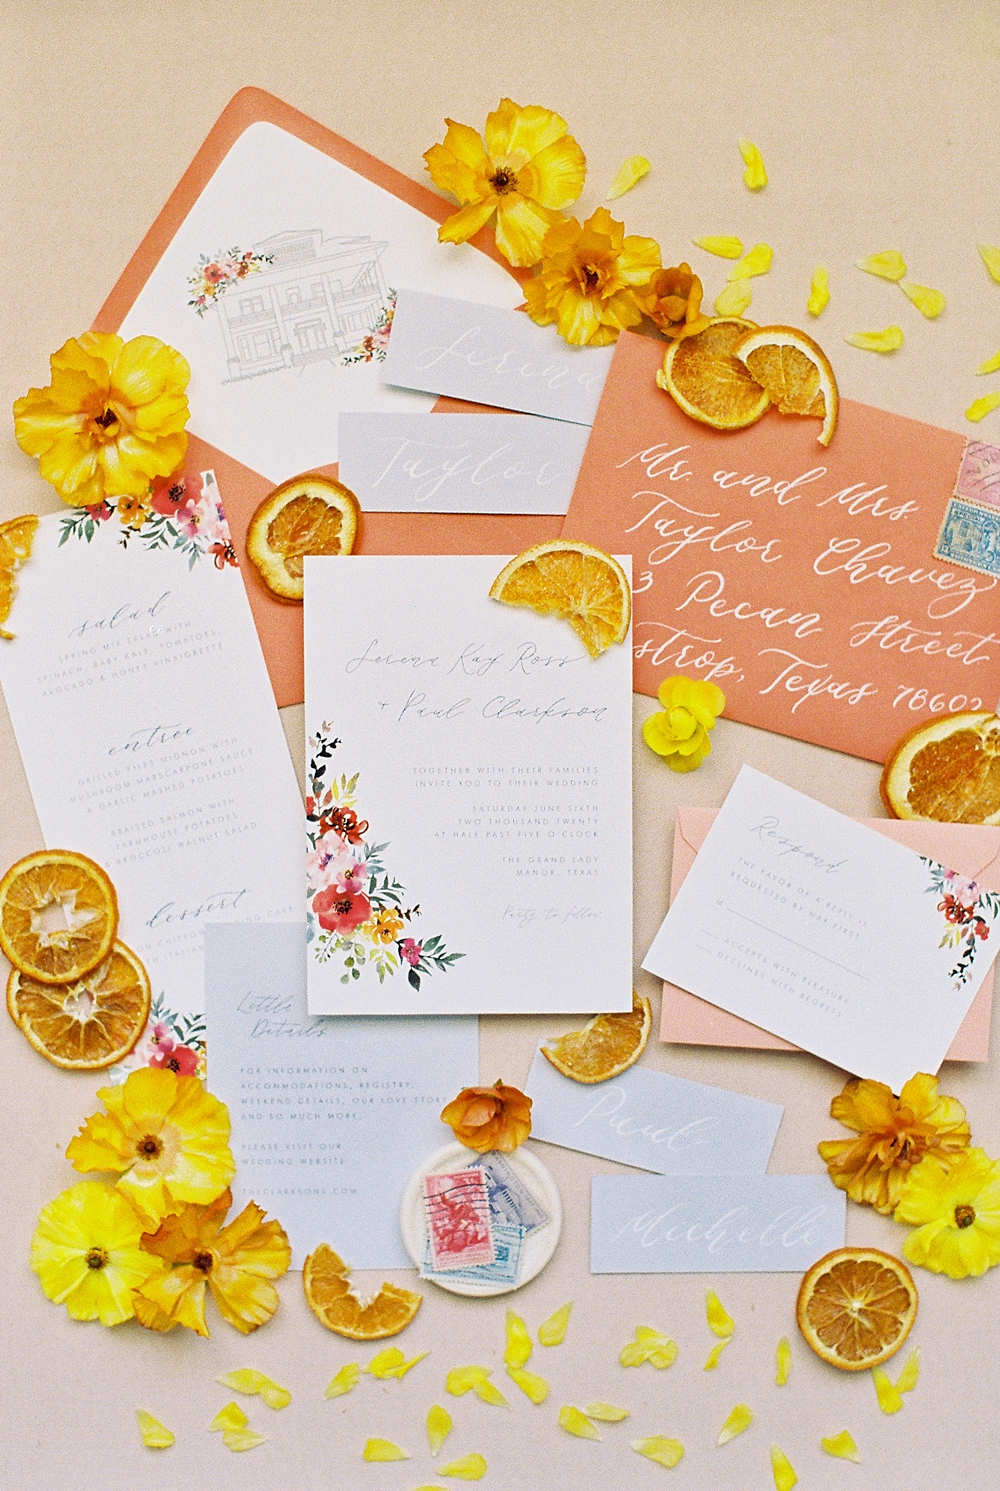 Kristin-La-Voie-Photography-Austin-Wedding-Photographer-the-grand-lady-3-2